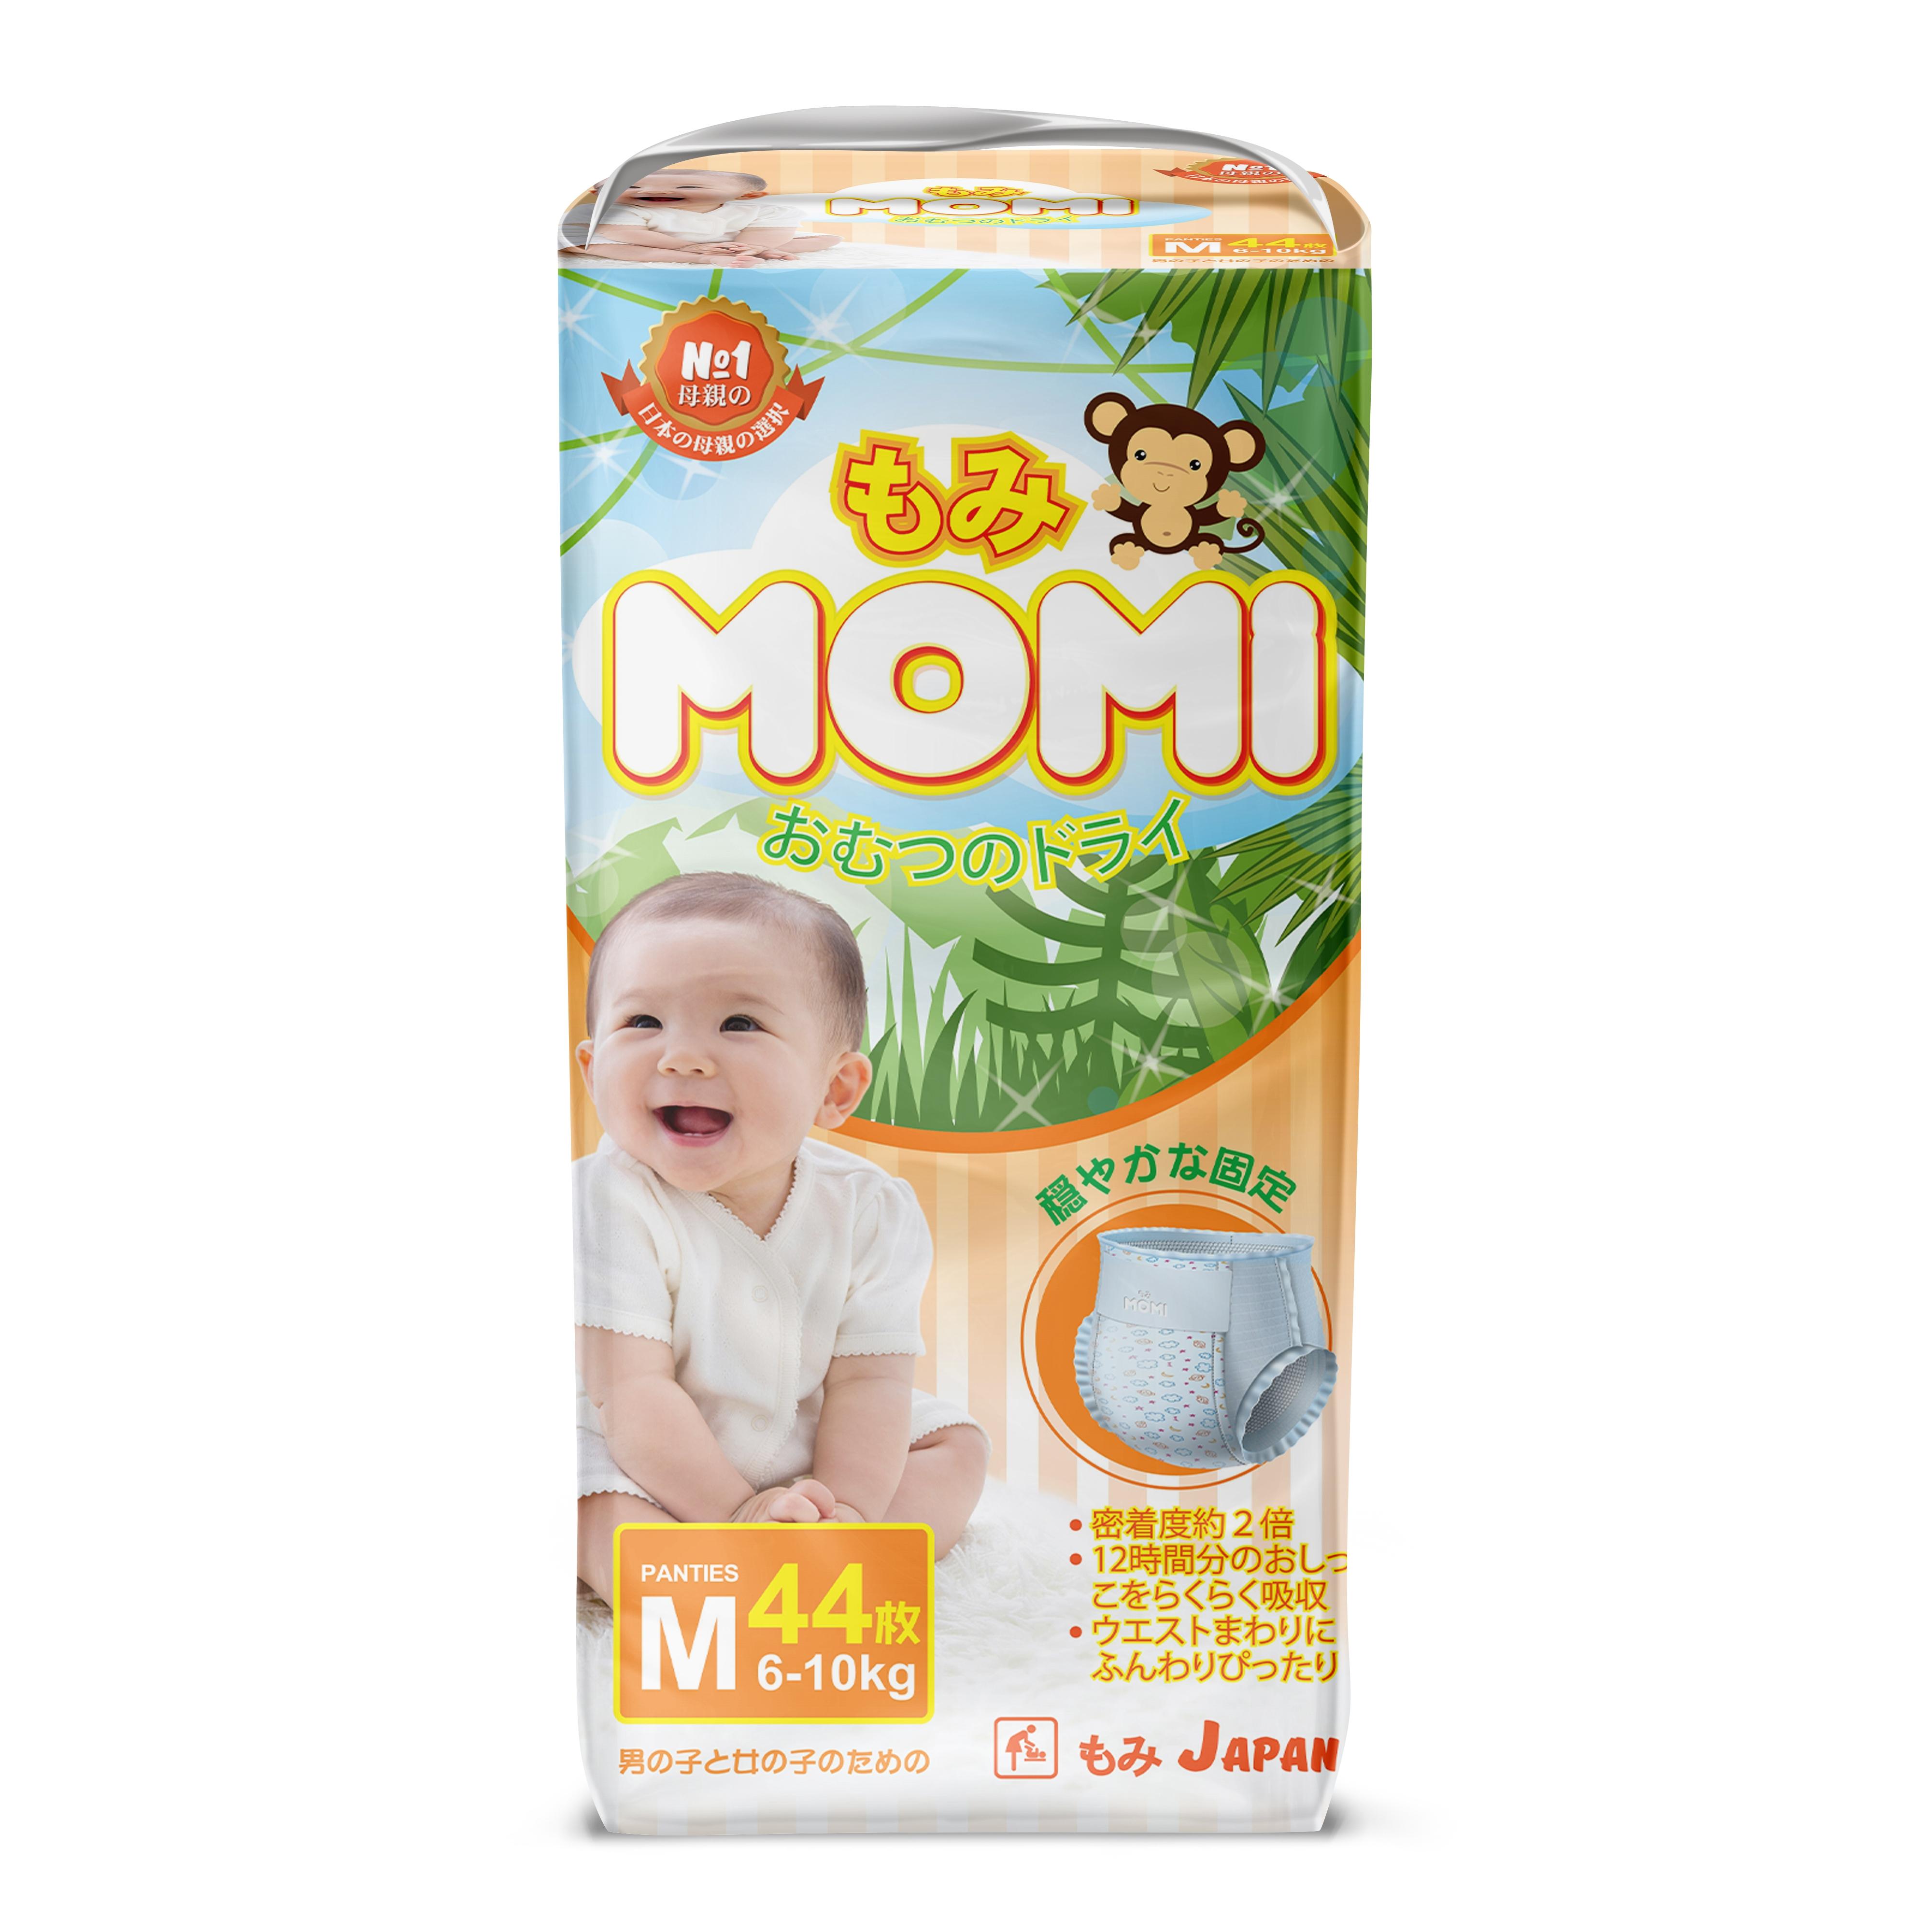 Tрусики Momi 6-10 кг (44 шт) M<br>